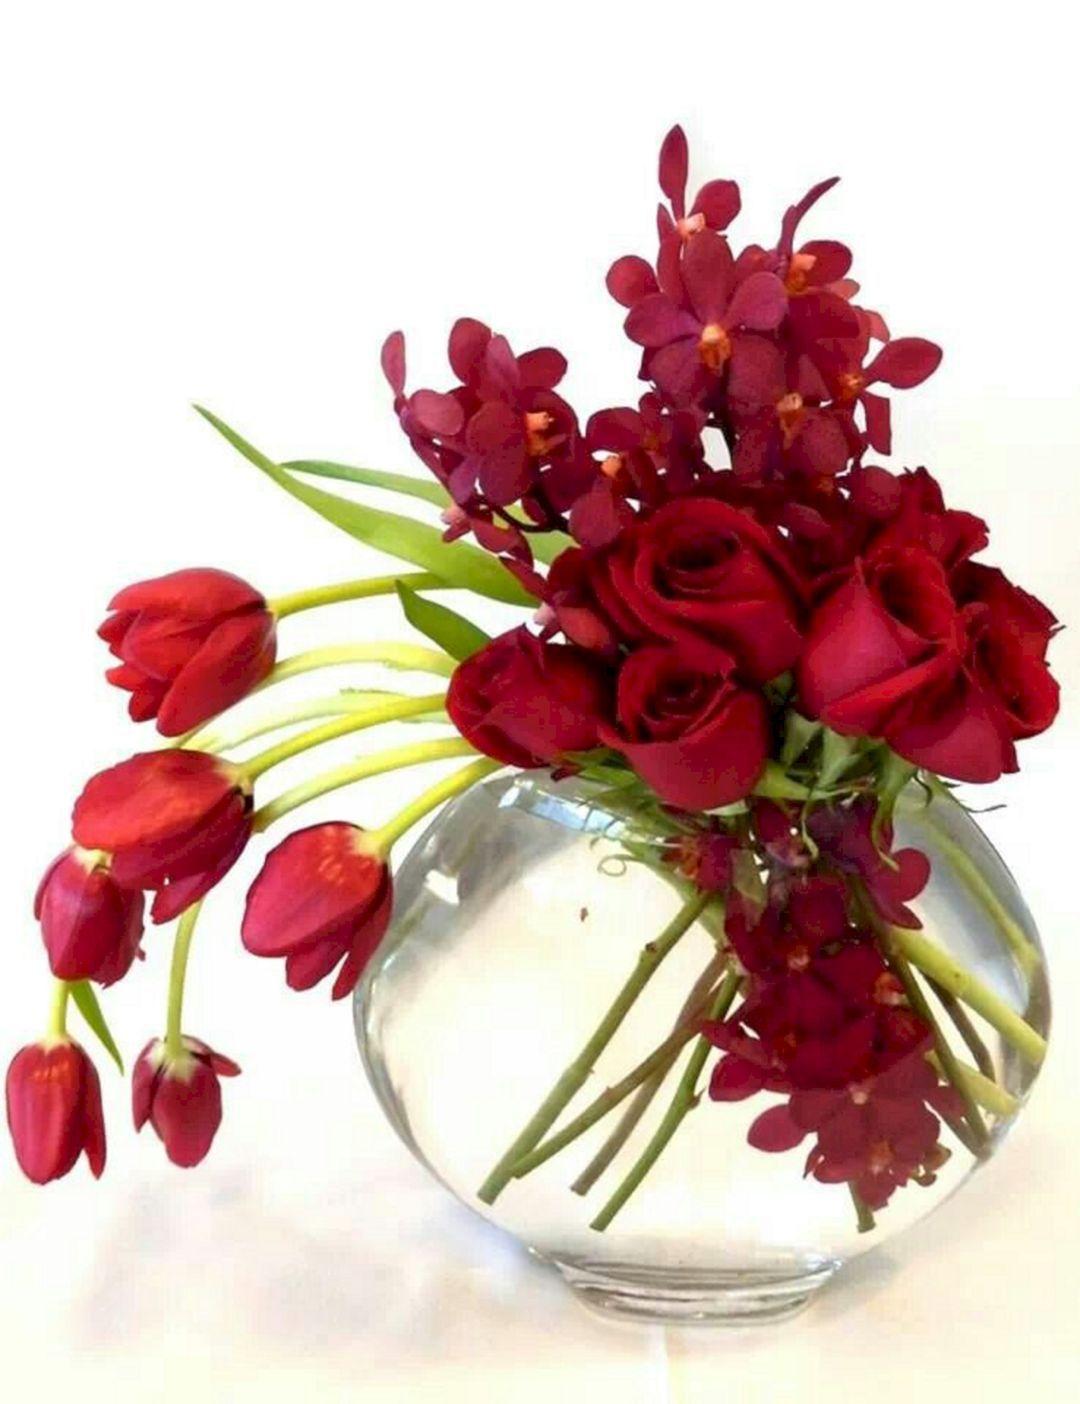 35 beautiful valentine floral arrangements ideas for your beloved beautiful valentine floral arrangements ideas 020 izmirmasajfo